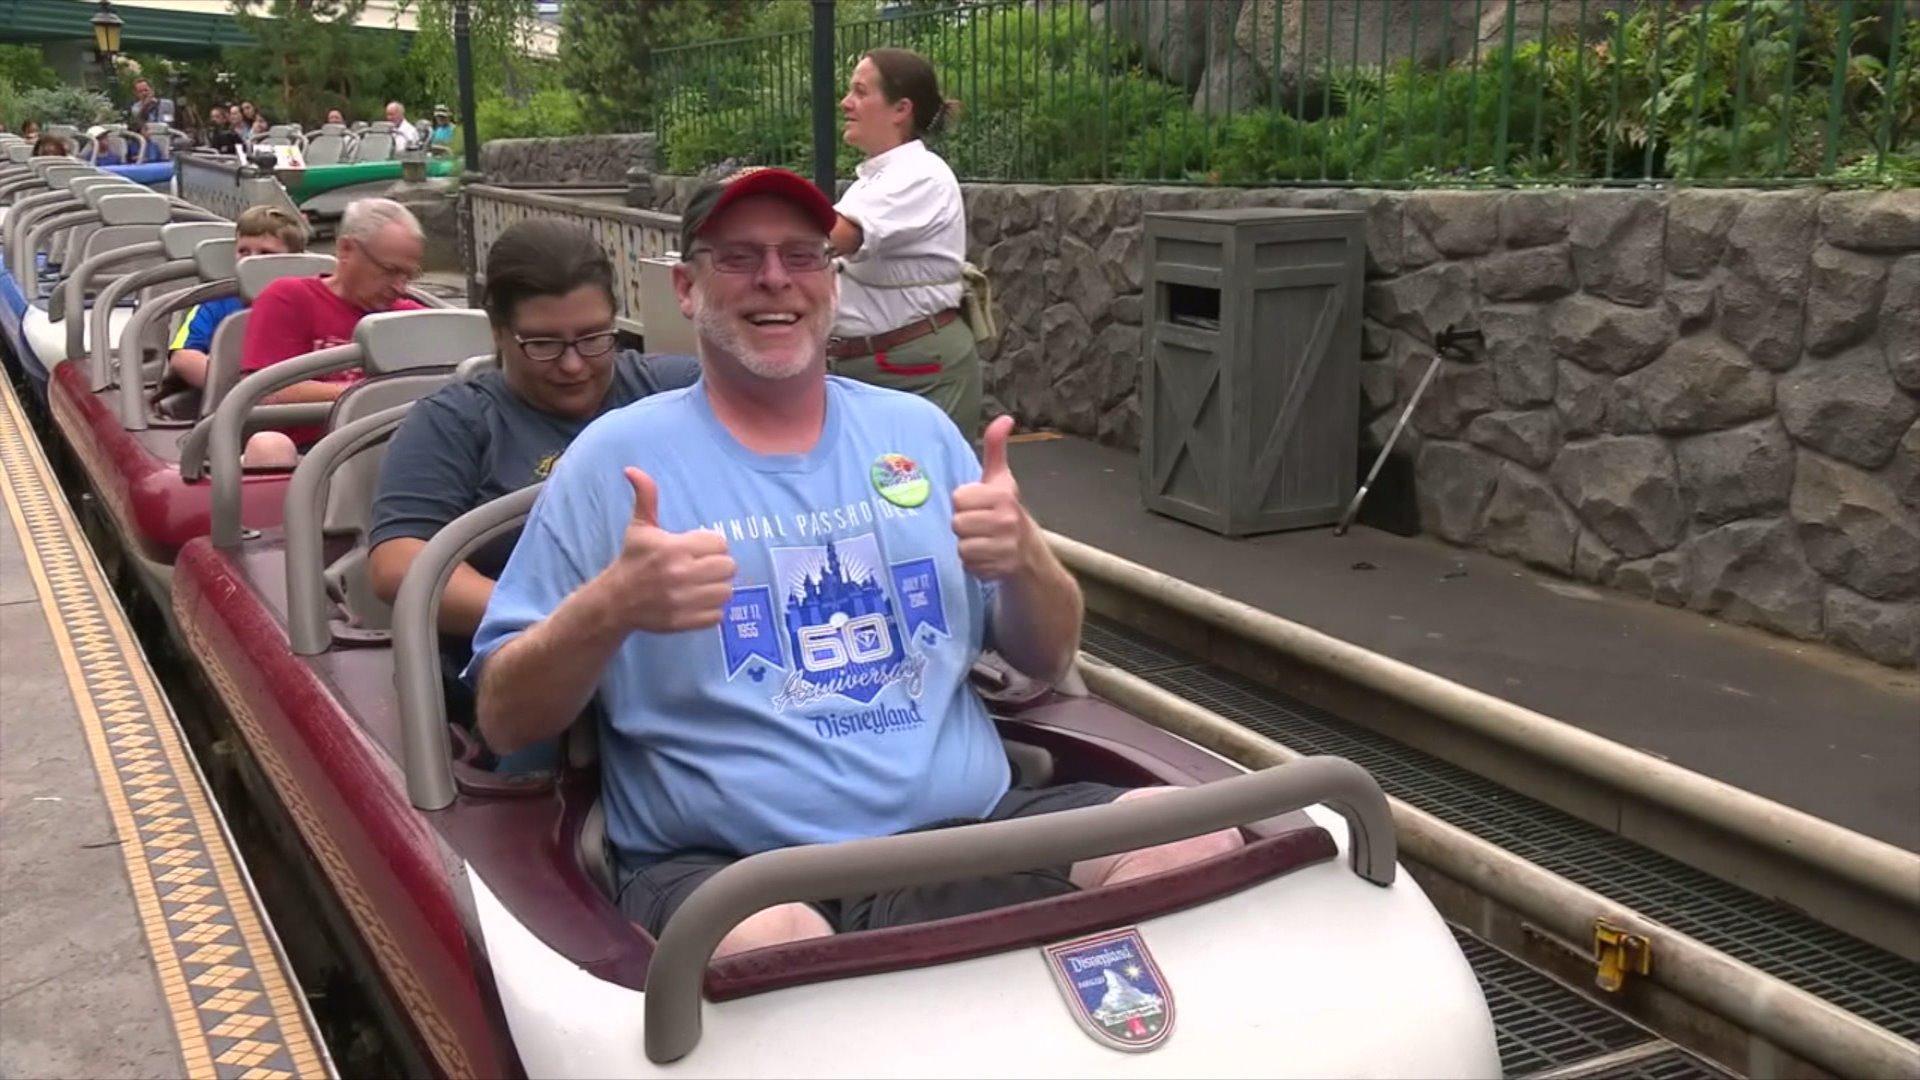 Man Visits Disneyland for 2,000th Consecutive Day